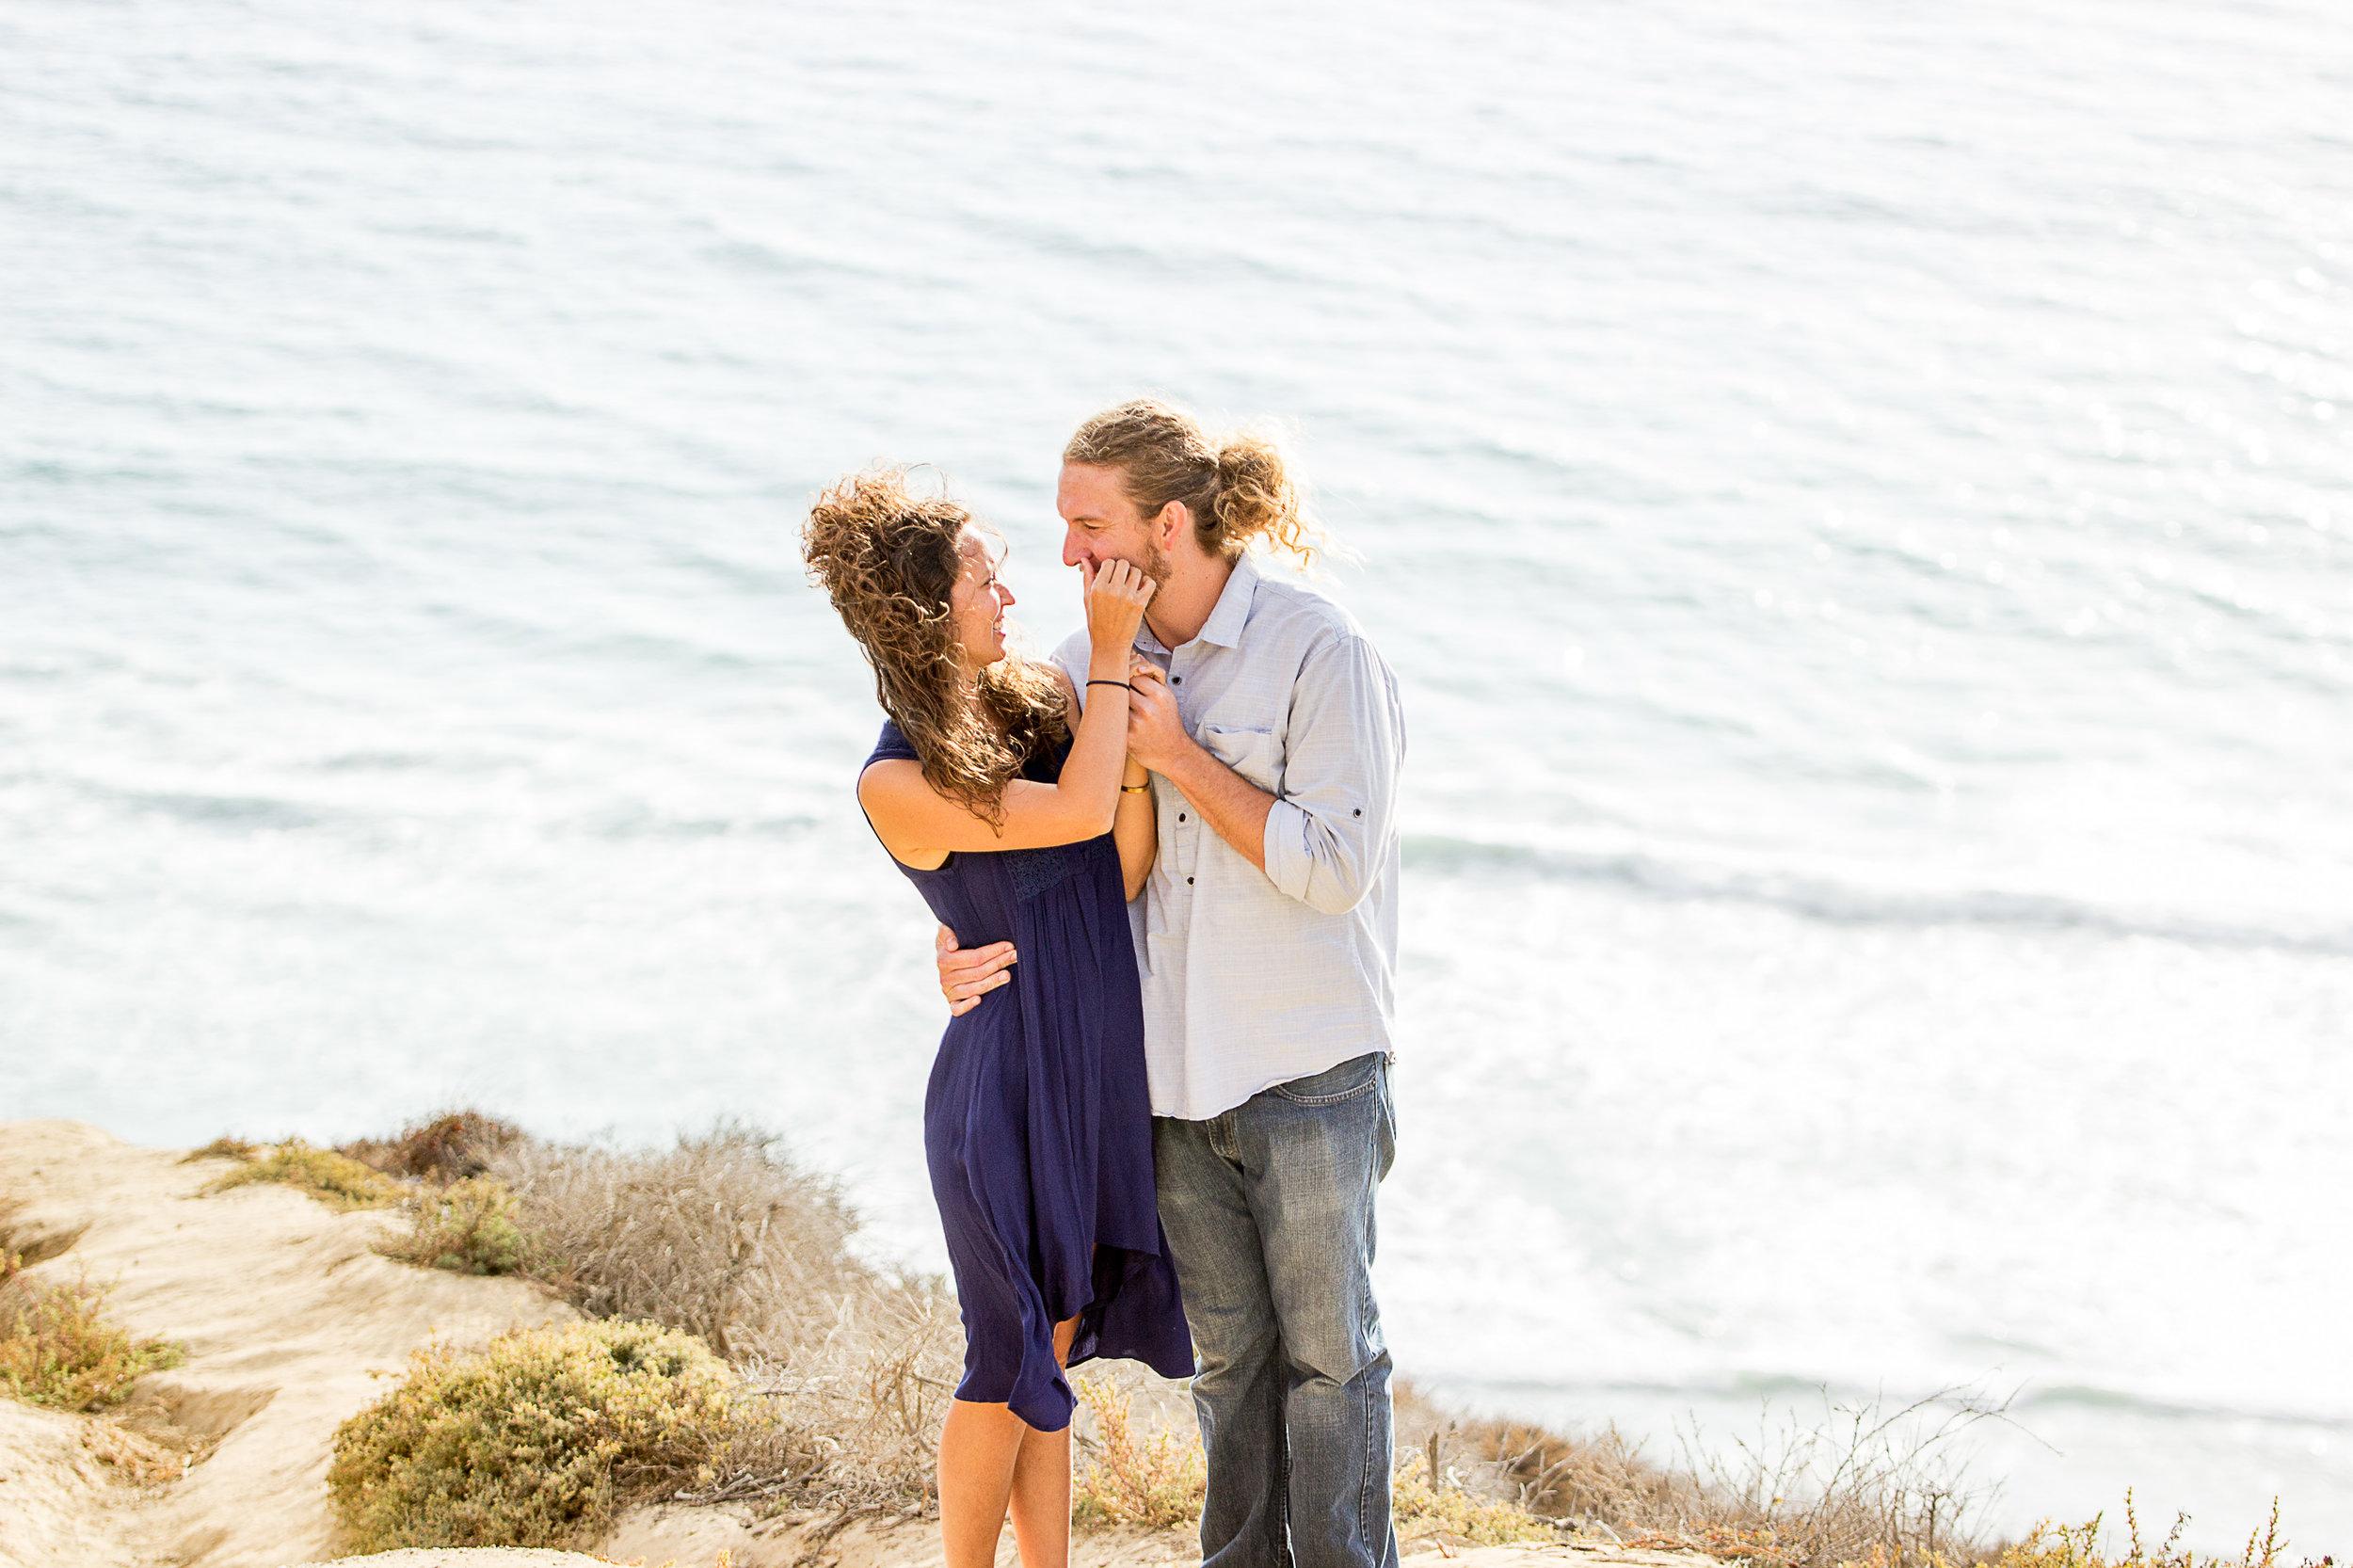 snuggle-up-couple-pose-la-jolla-torrey-pines-san-diego-ocean